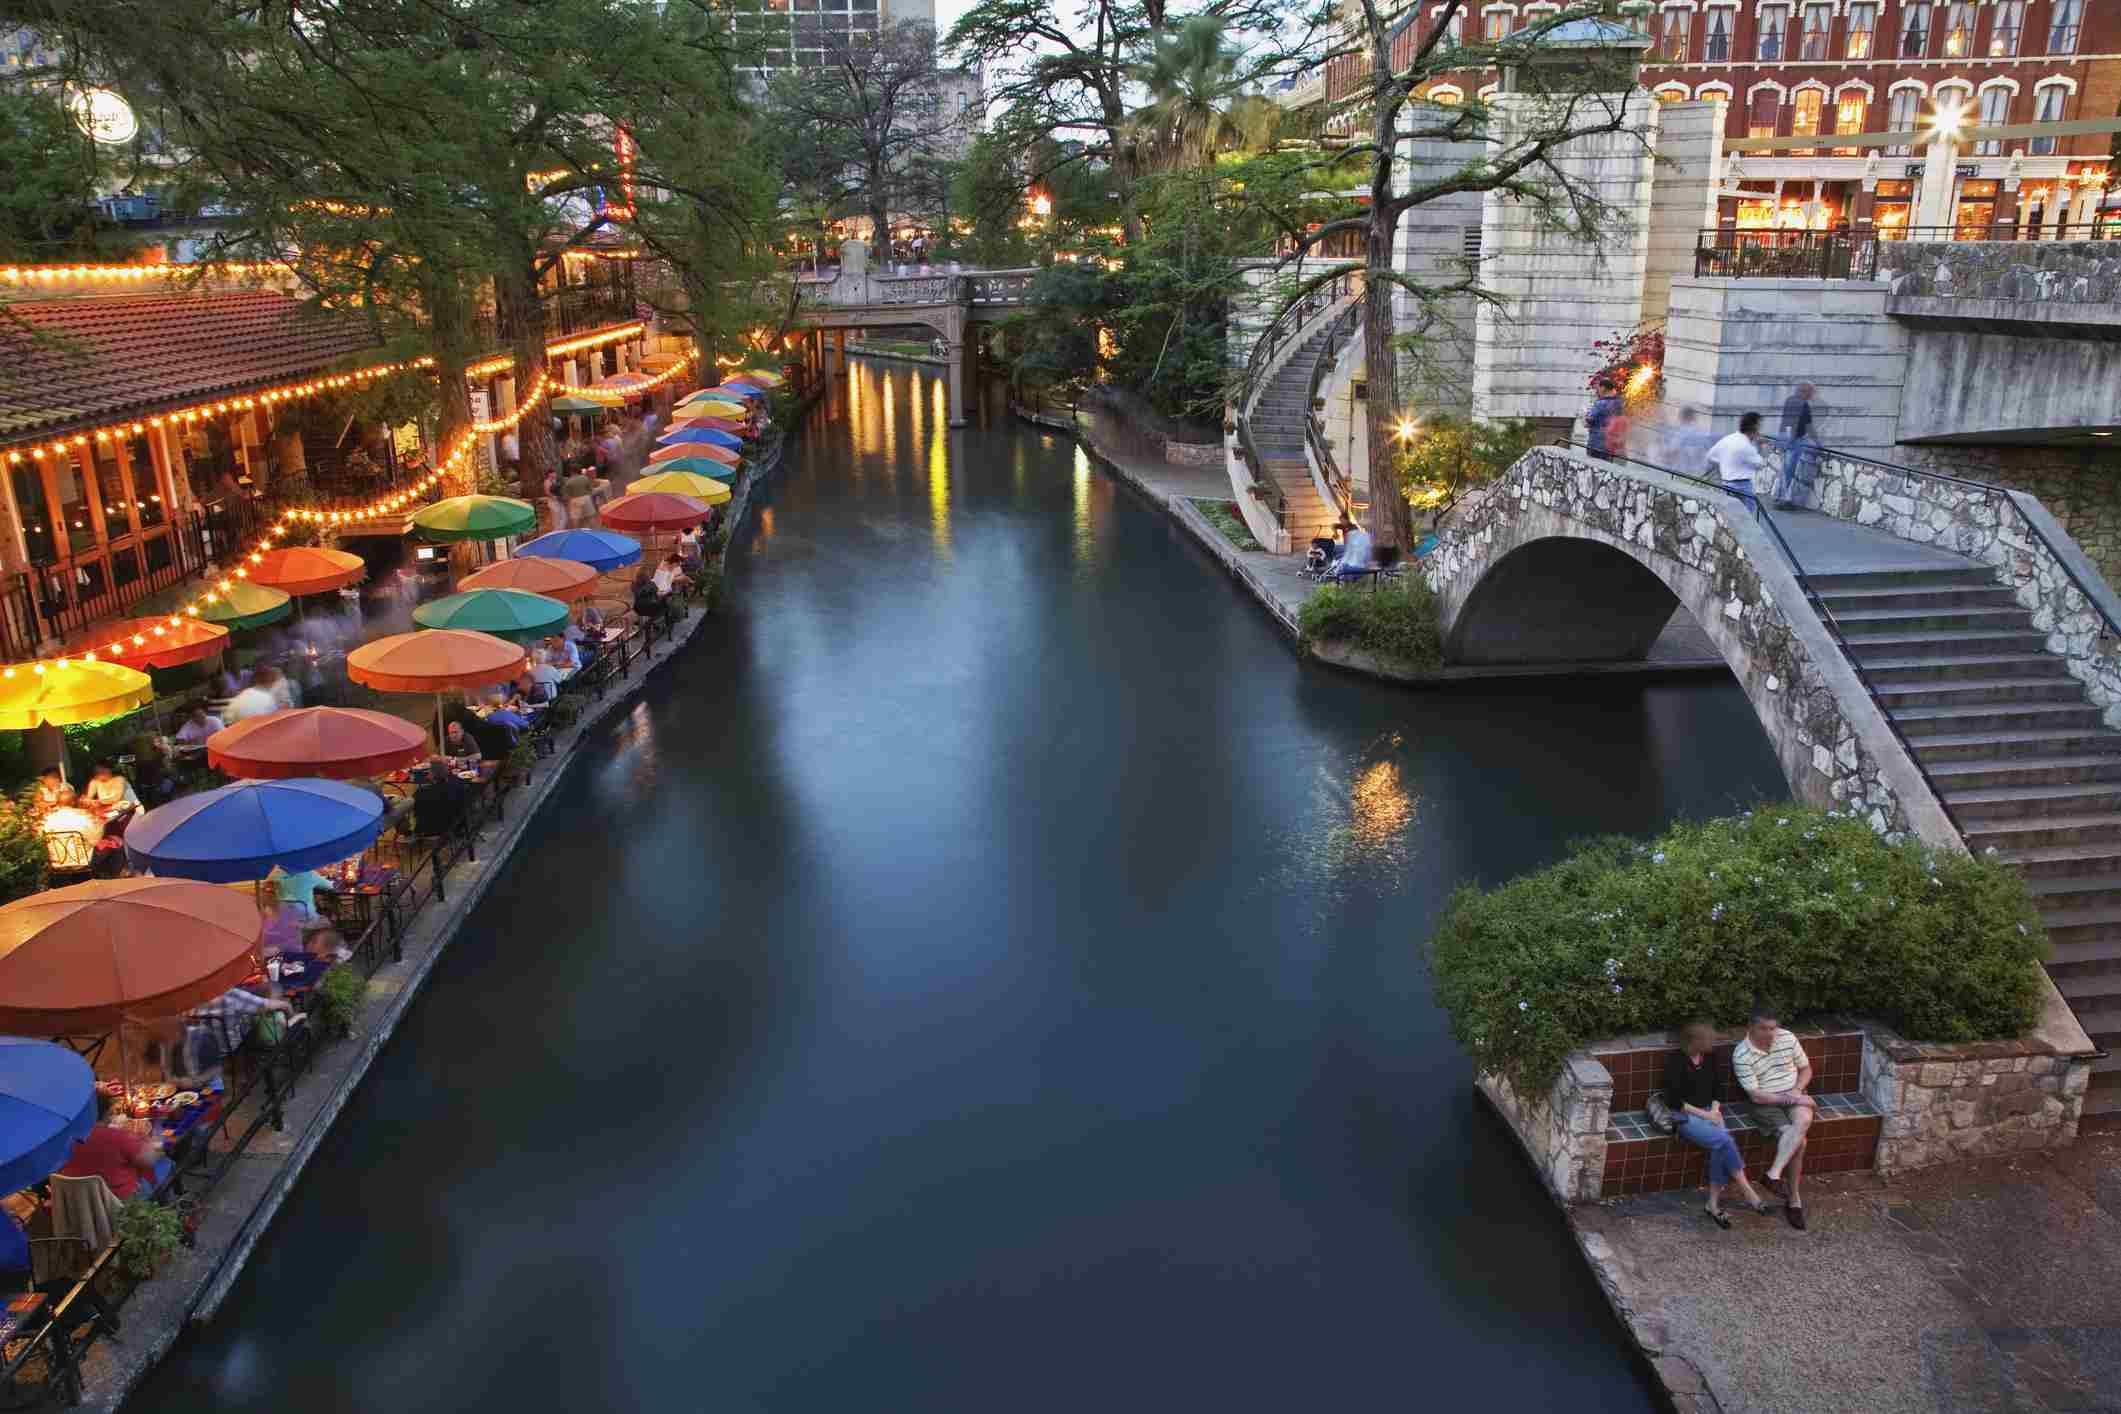 Texas, San Antonio, San Antonio River and River Walk at dusk